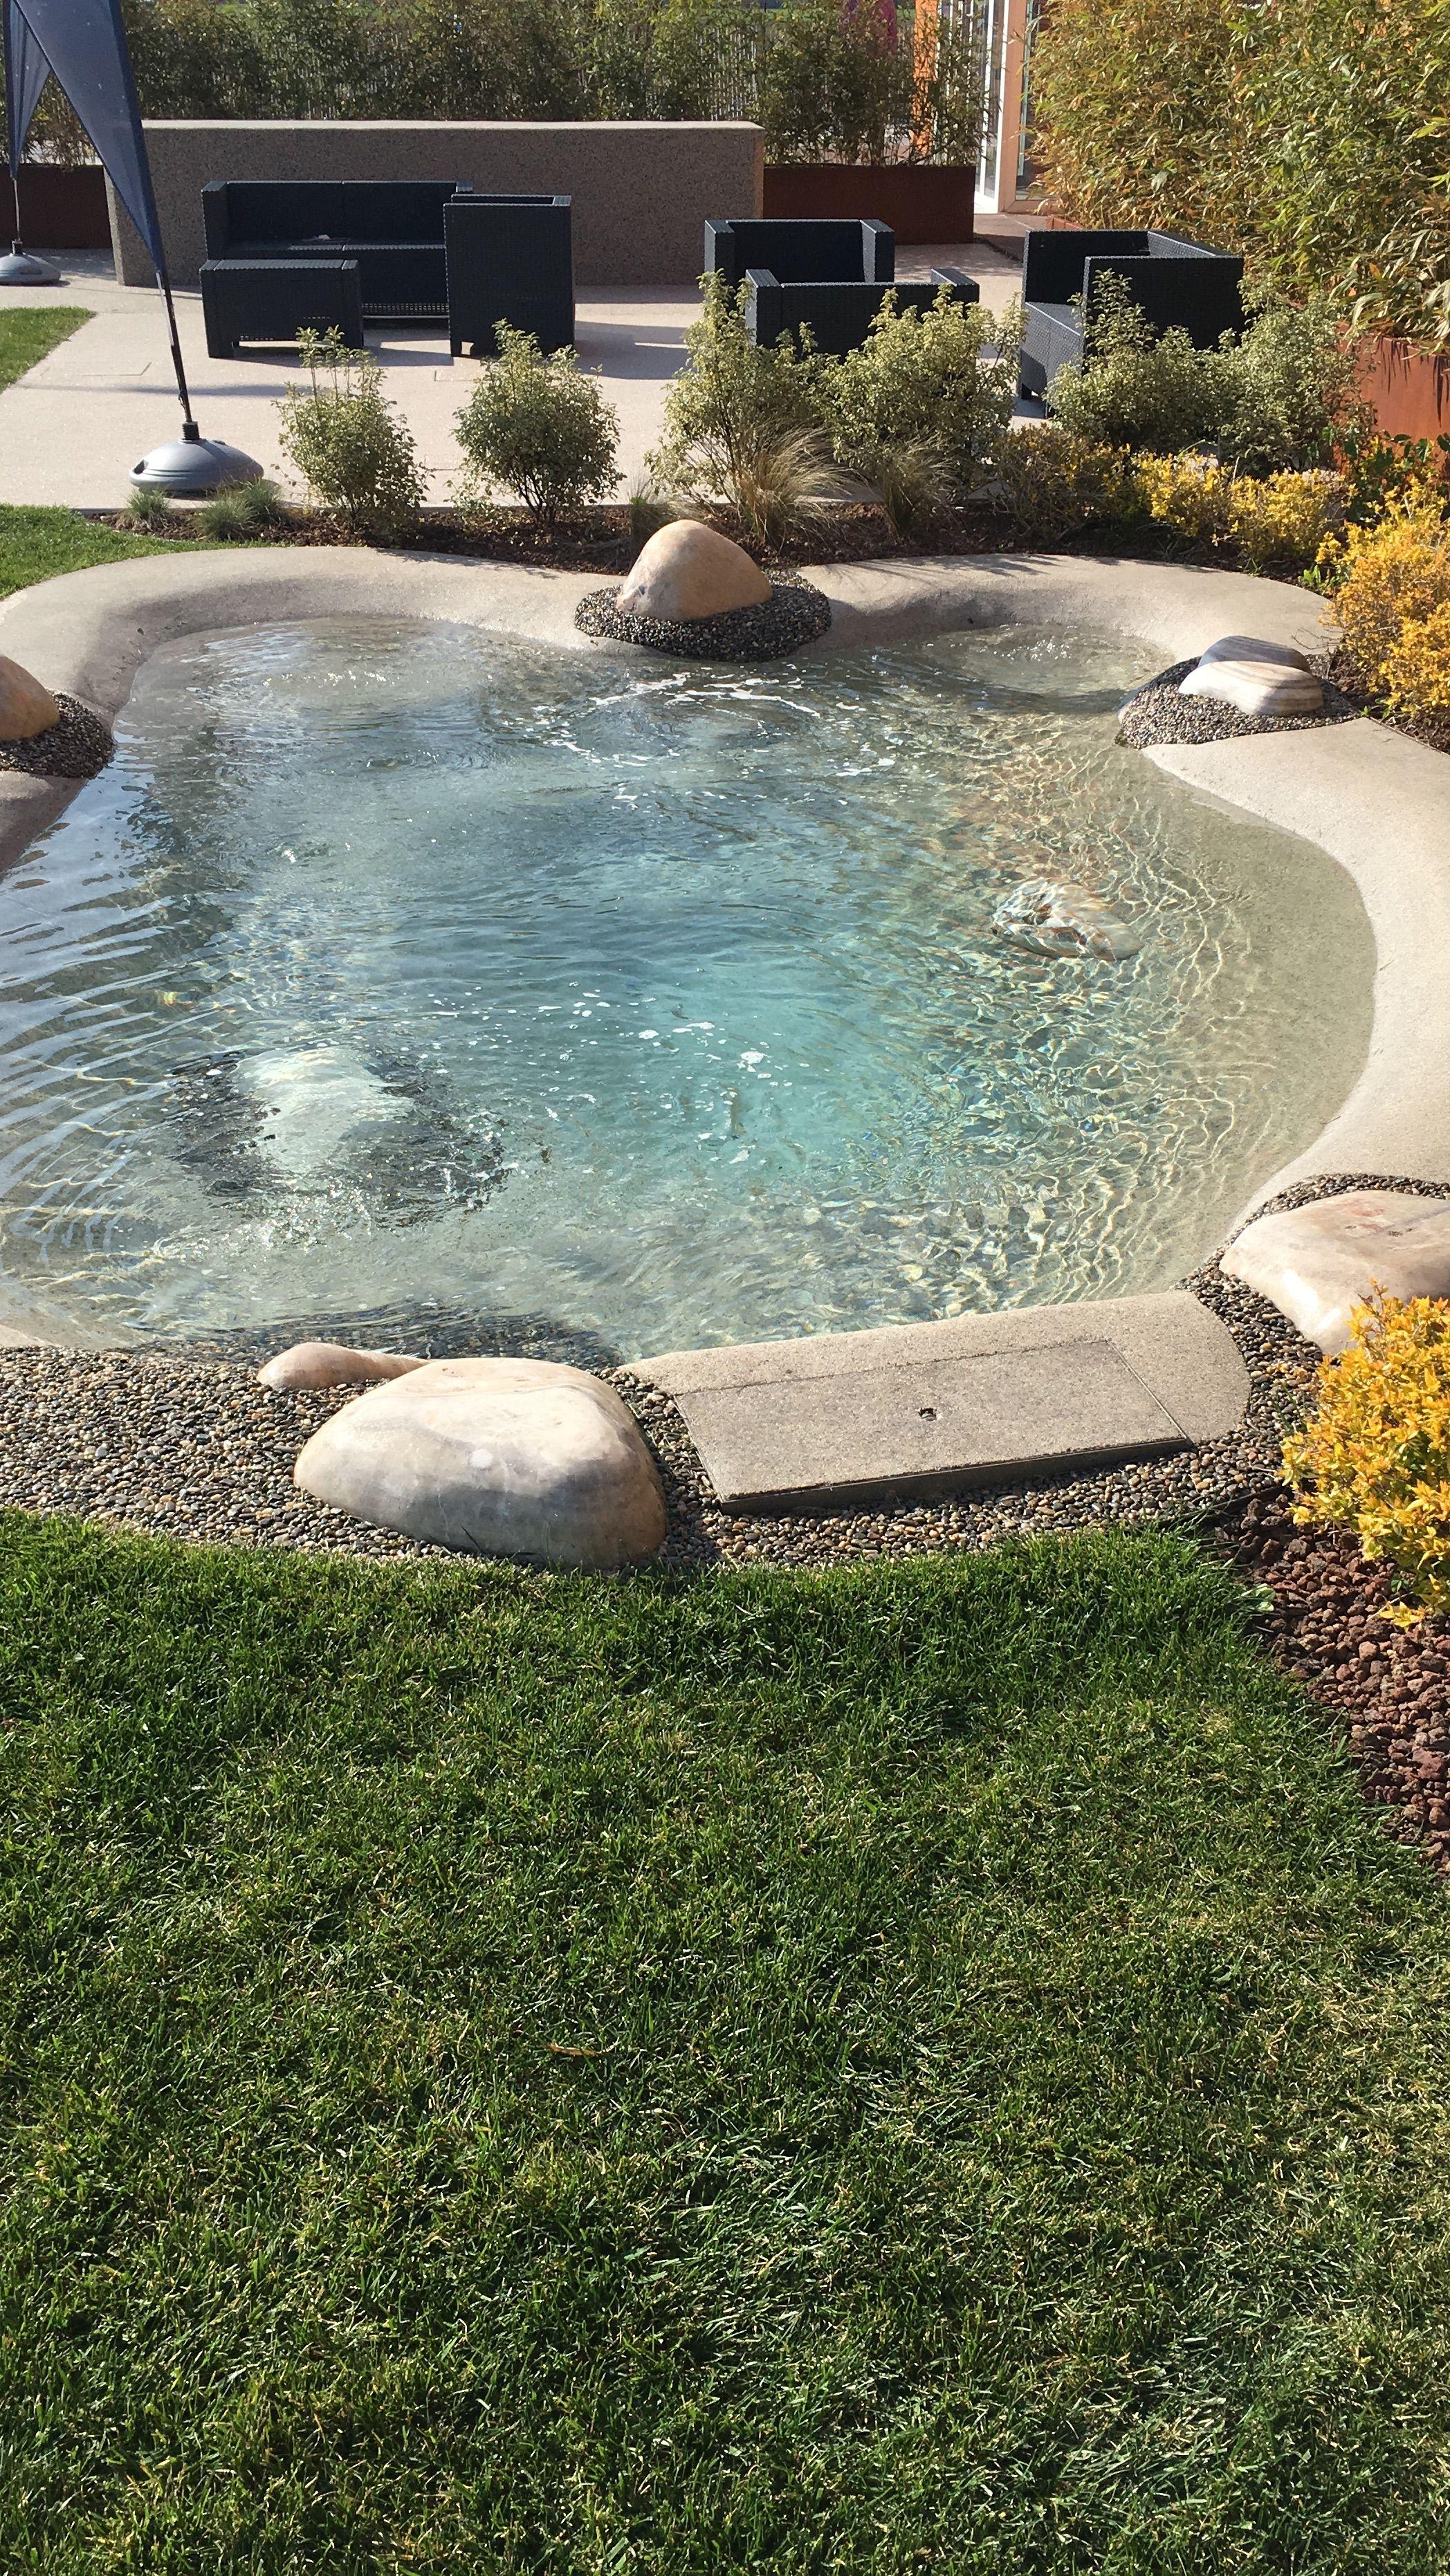 Pin By Jack Verhagen On Piscinas Backyard Pool Designs Small Backyard Pools Backyard Beach